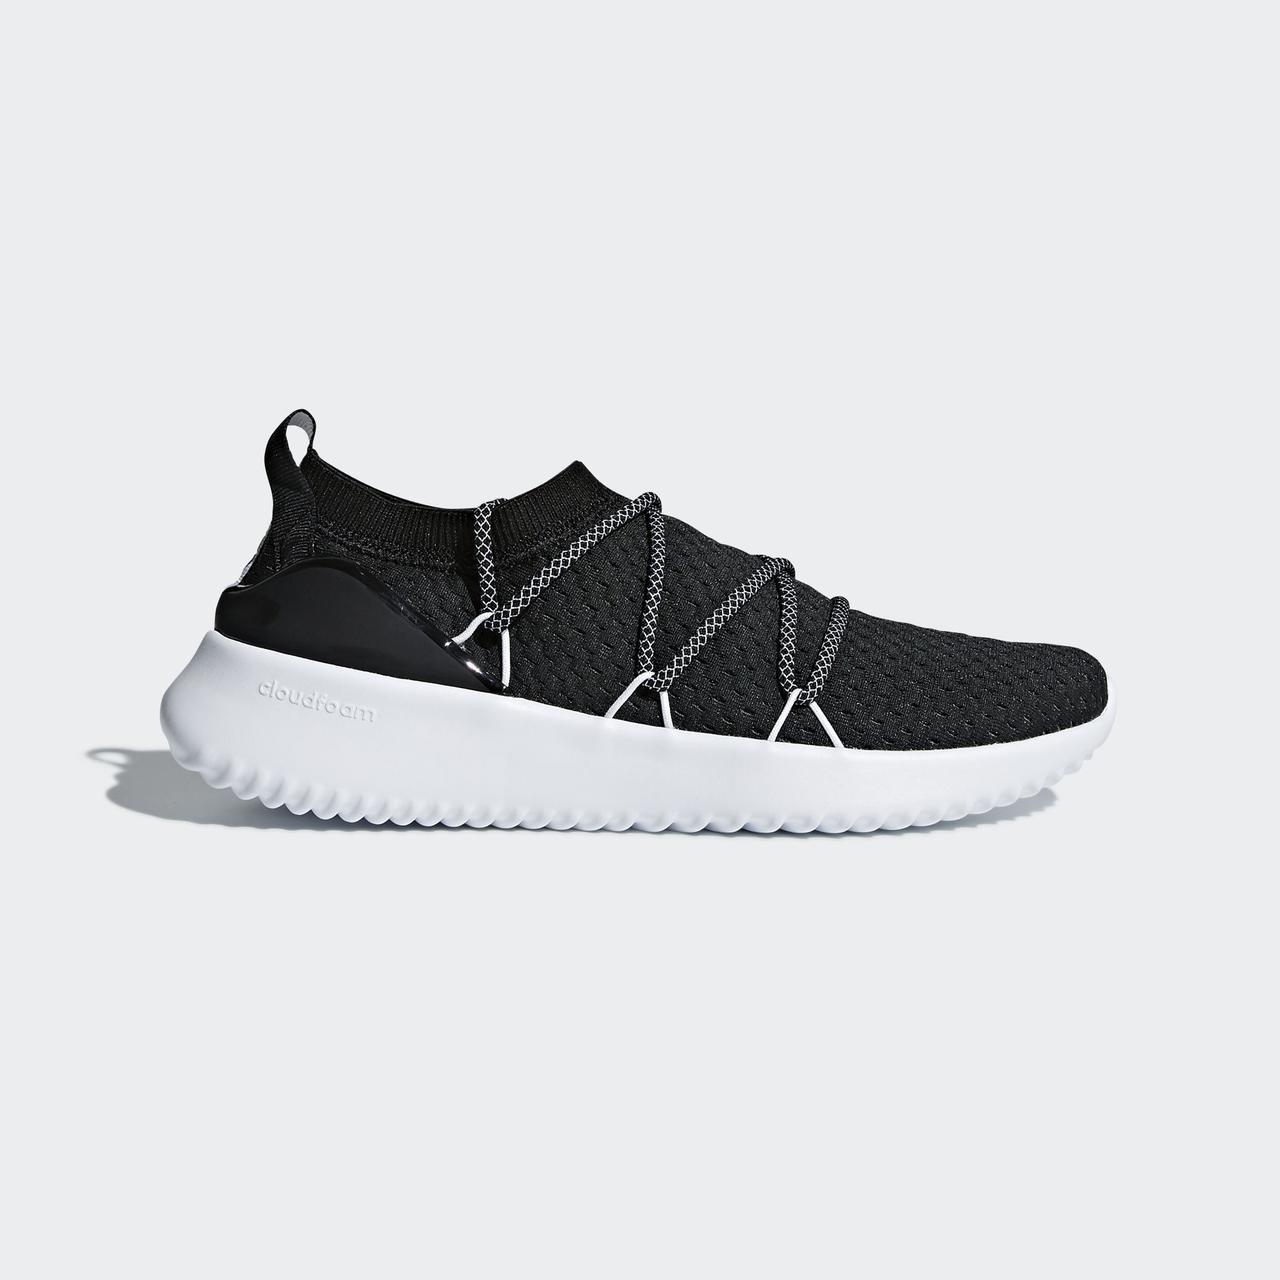 Женские кроссовки Adidas Performance Ultimamotion (Артикул: B96474)